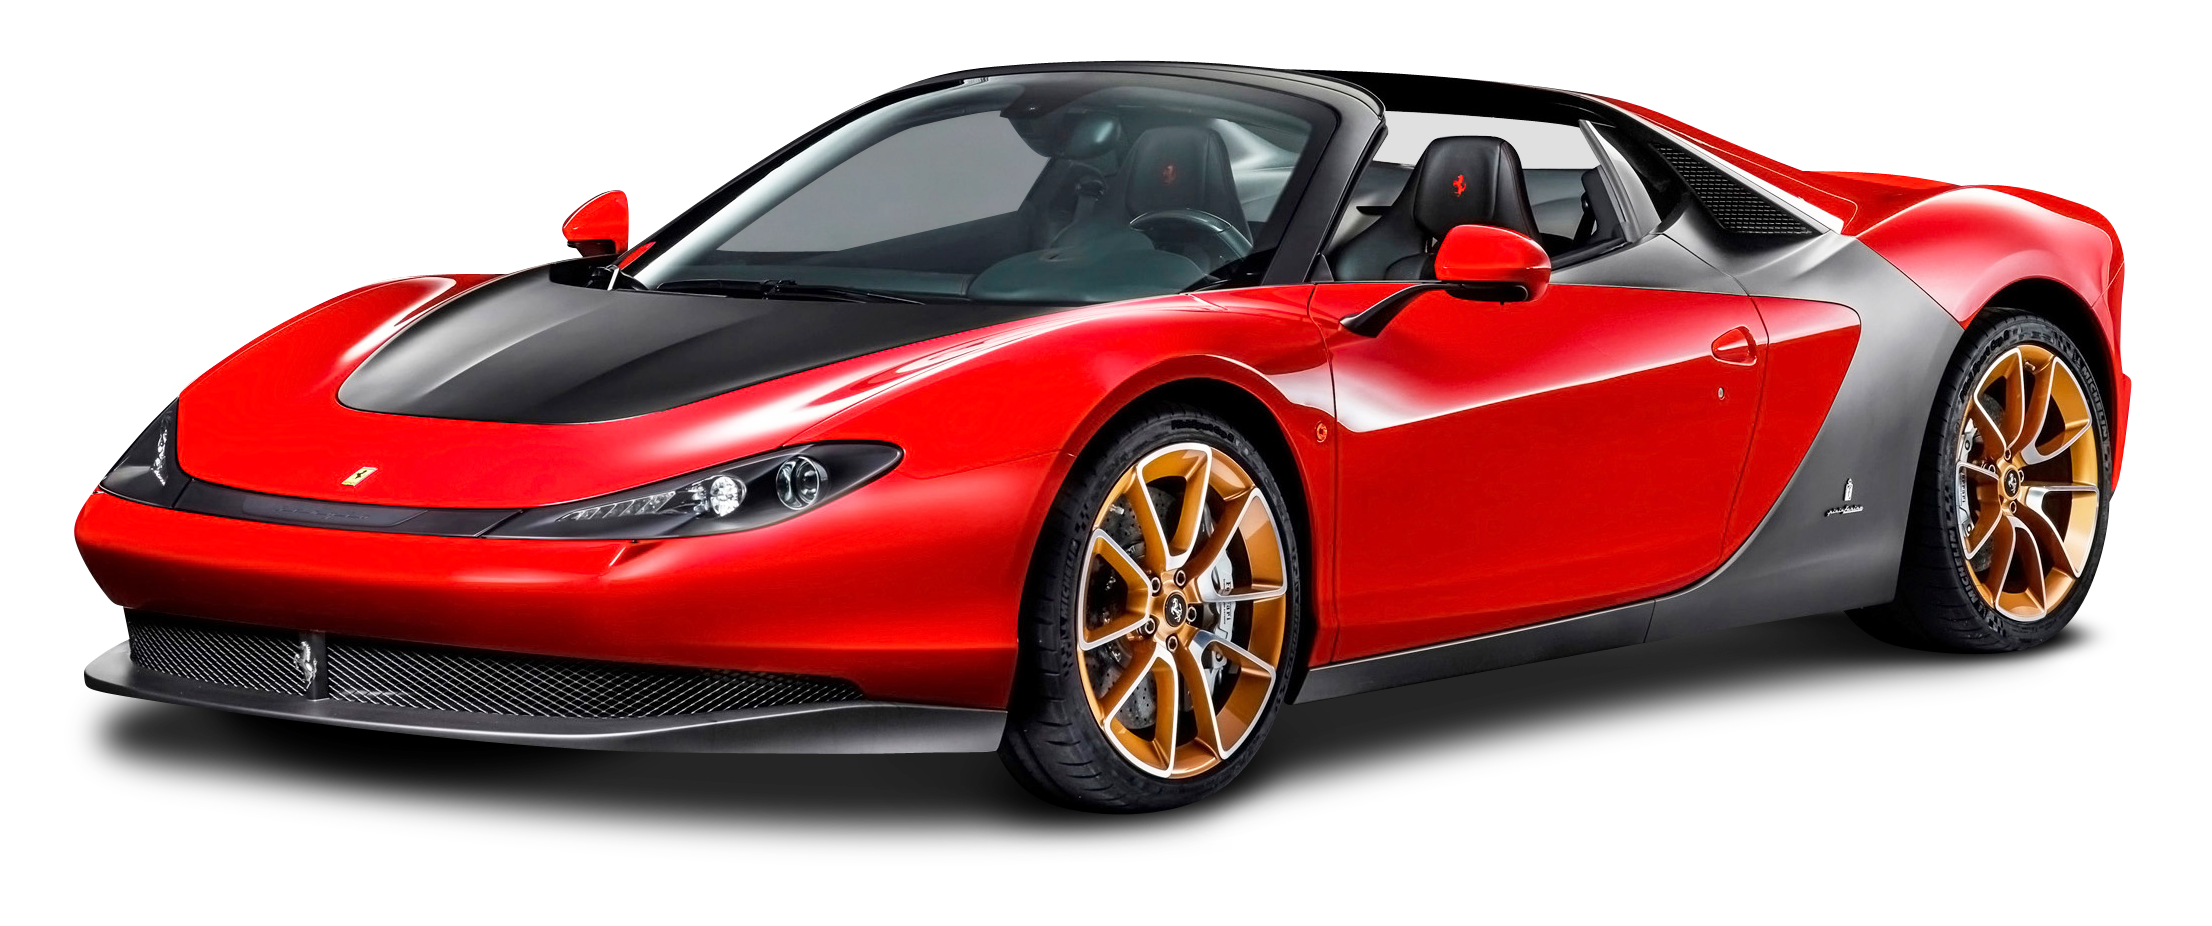 Ferrari Sergio Red Car Png Image Purepng Free Transparent Cc0